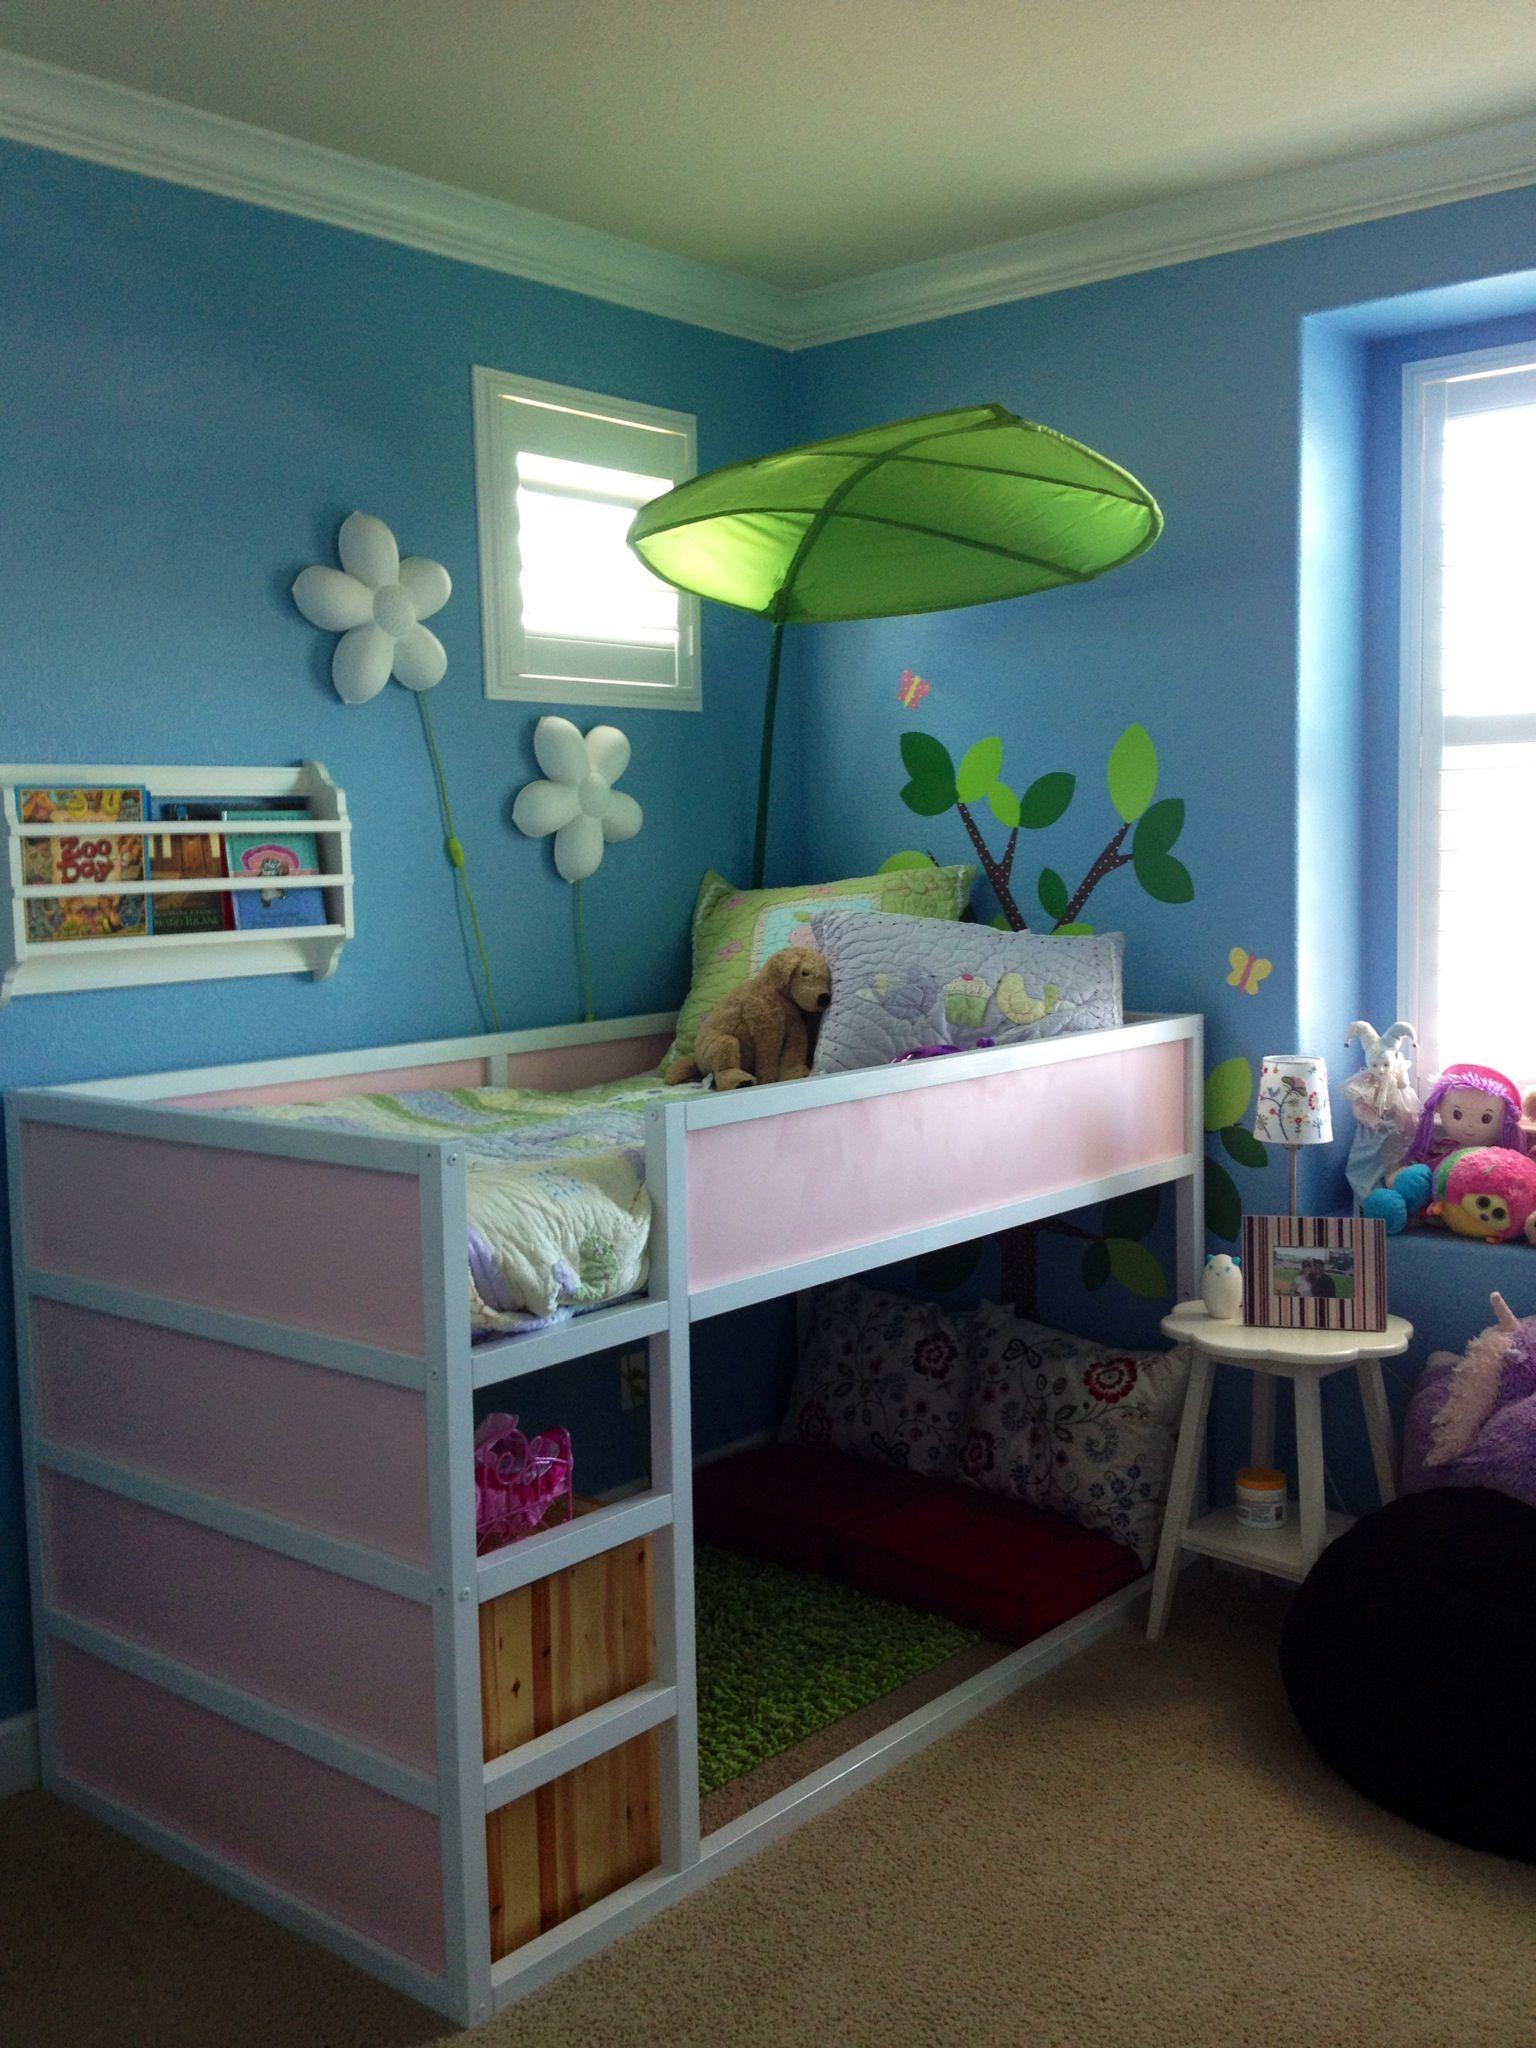 Kura loft bed ideas  Kura bed from Ikea with a reading nook below  My many ideas in one